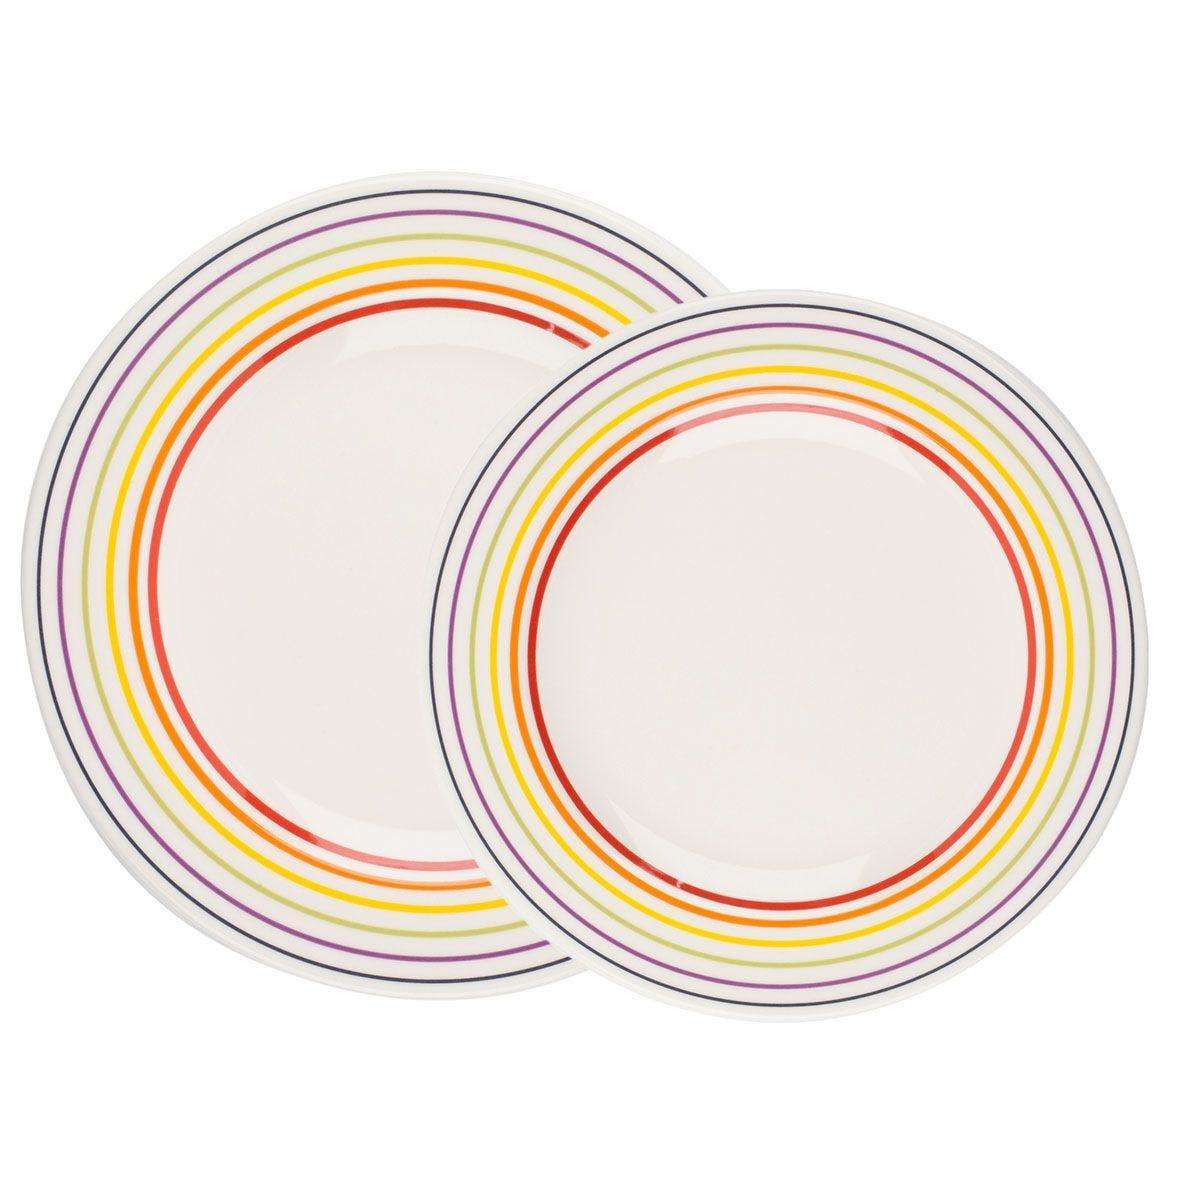 Bugatti Striped Dinner Plate Set - 16 Piece